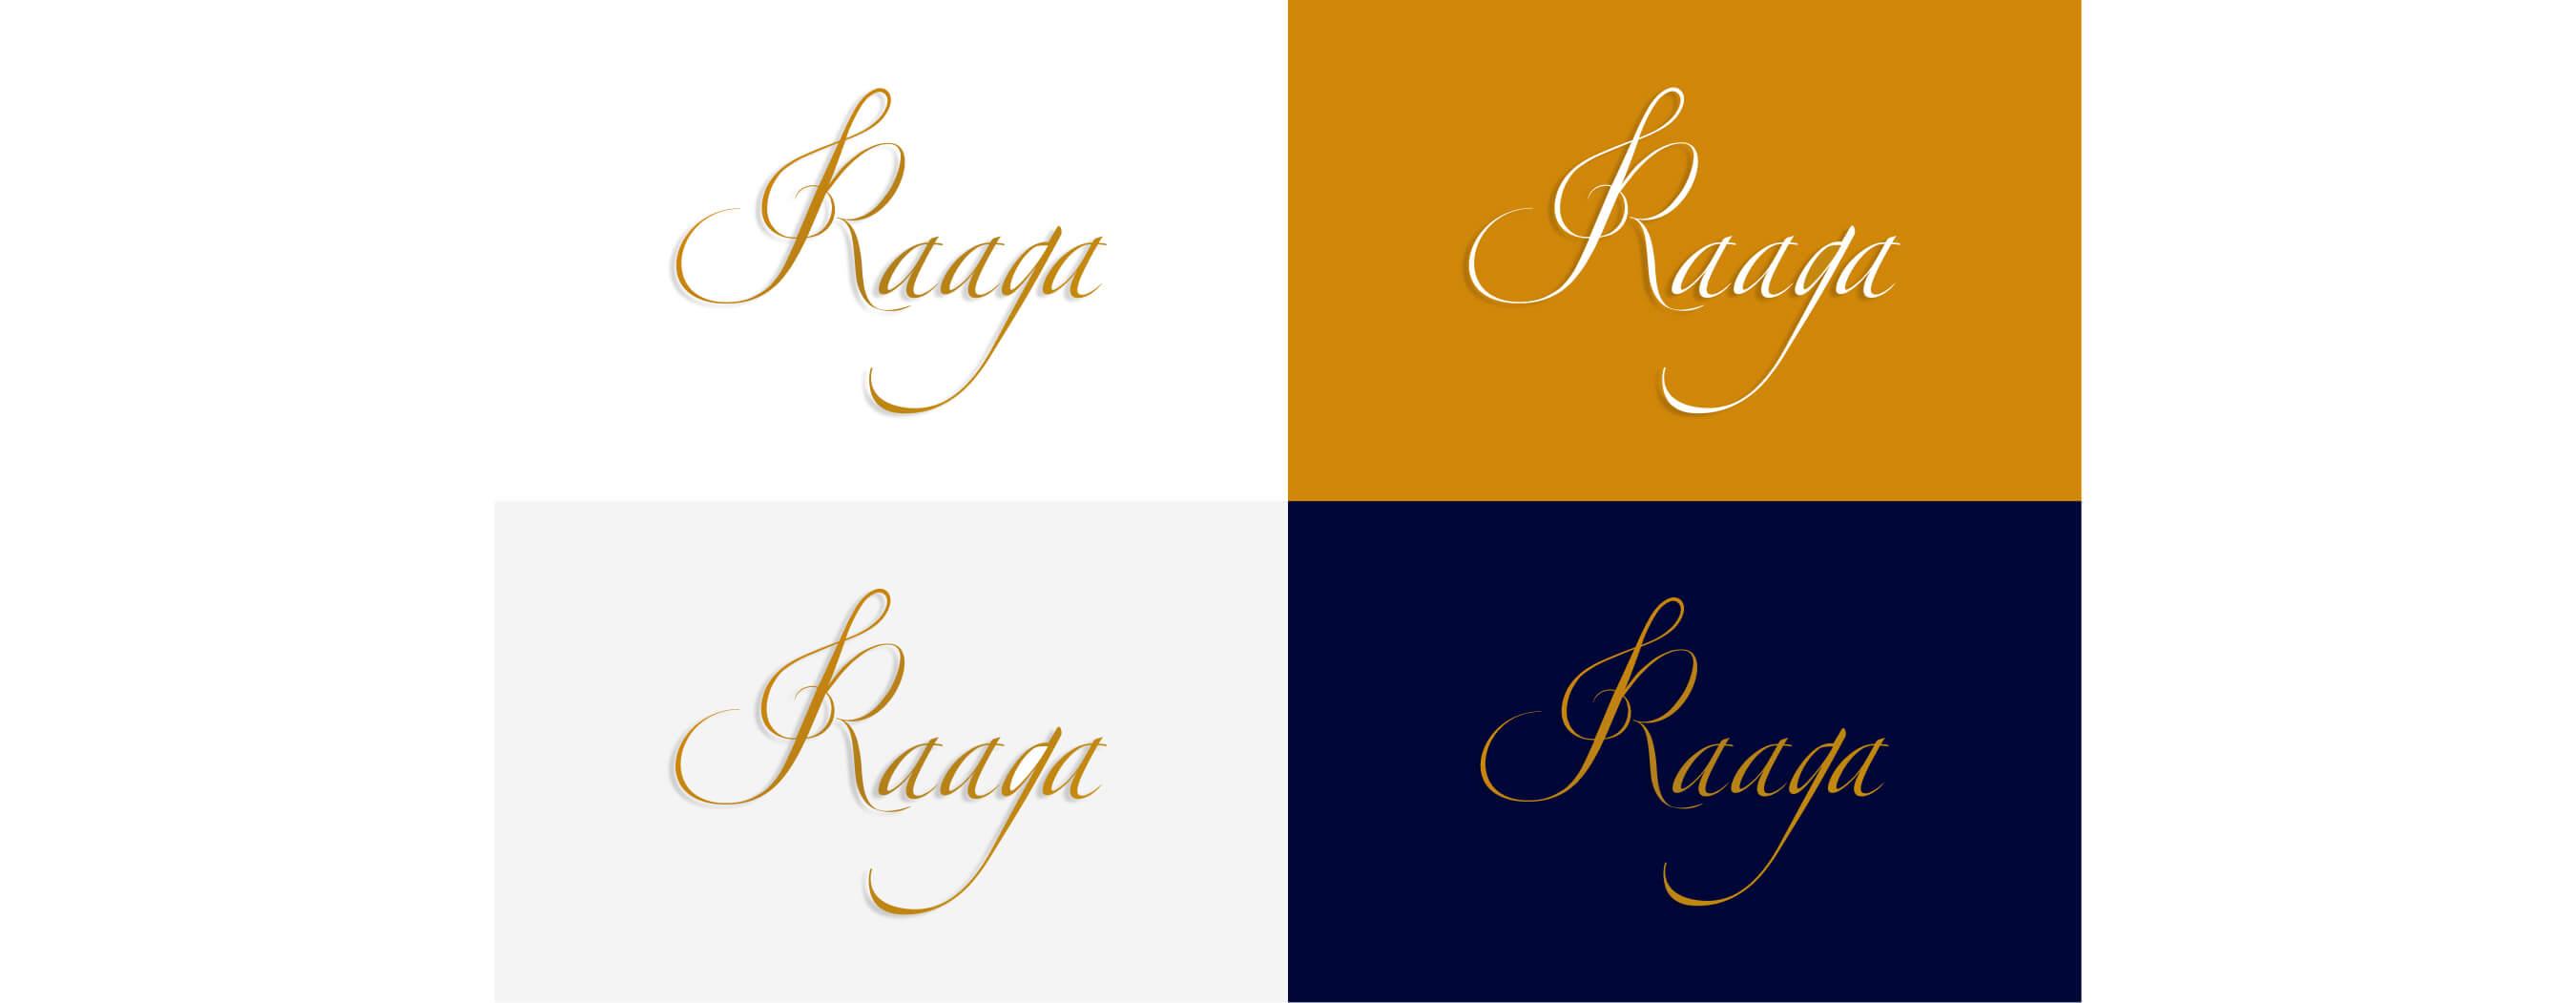 Raaga Logo Design by wow.design